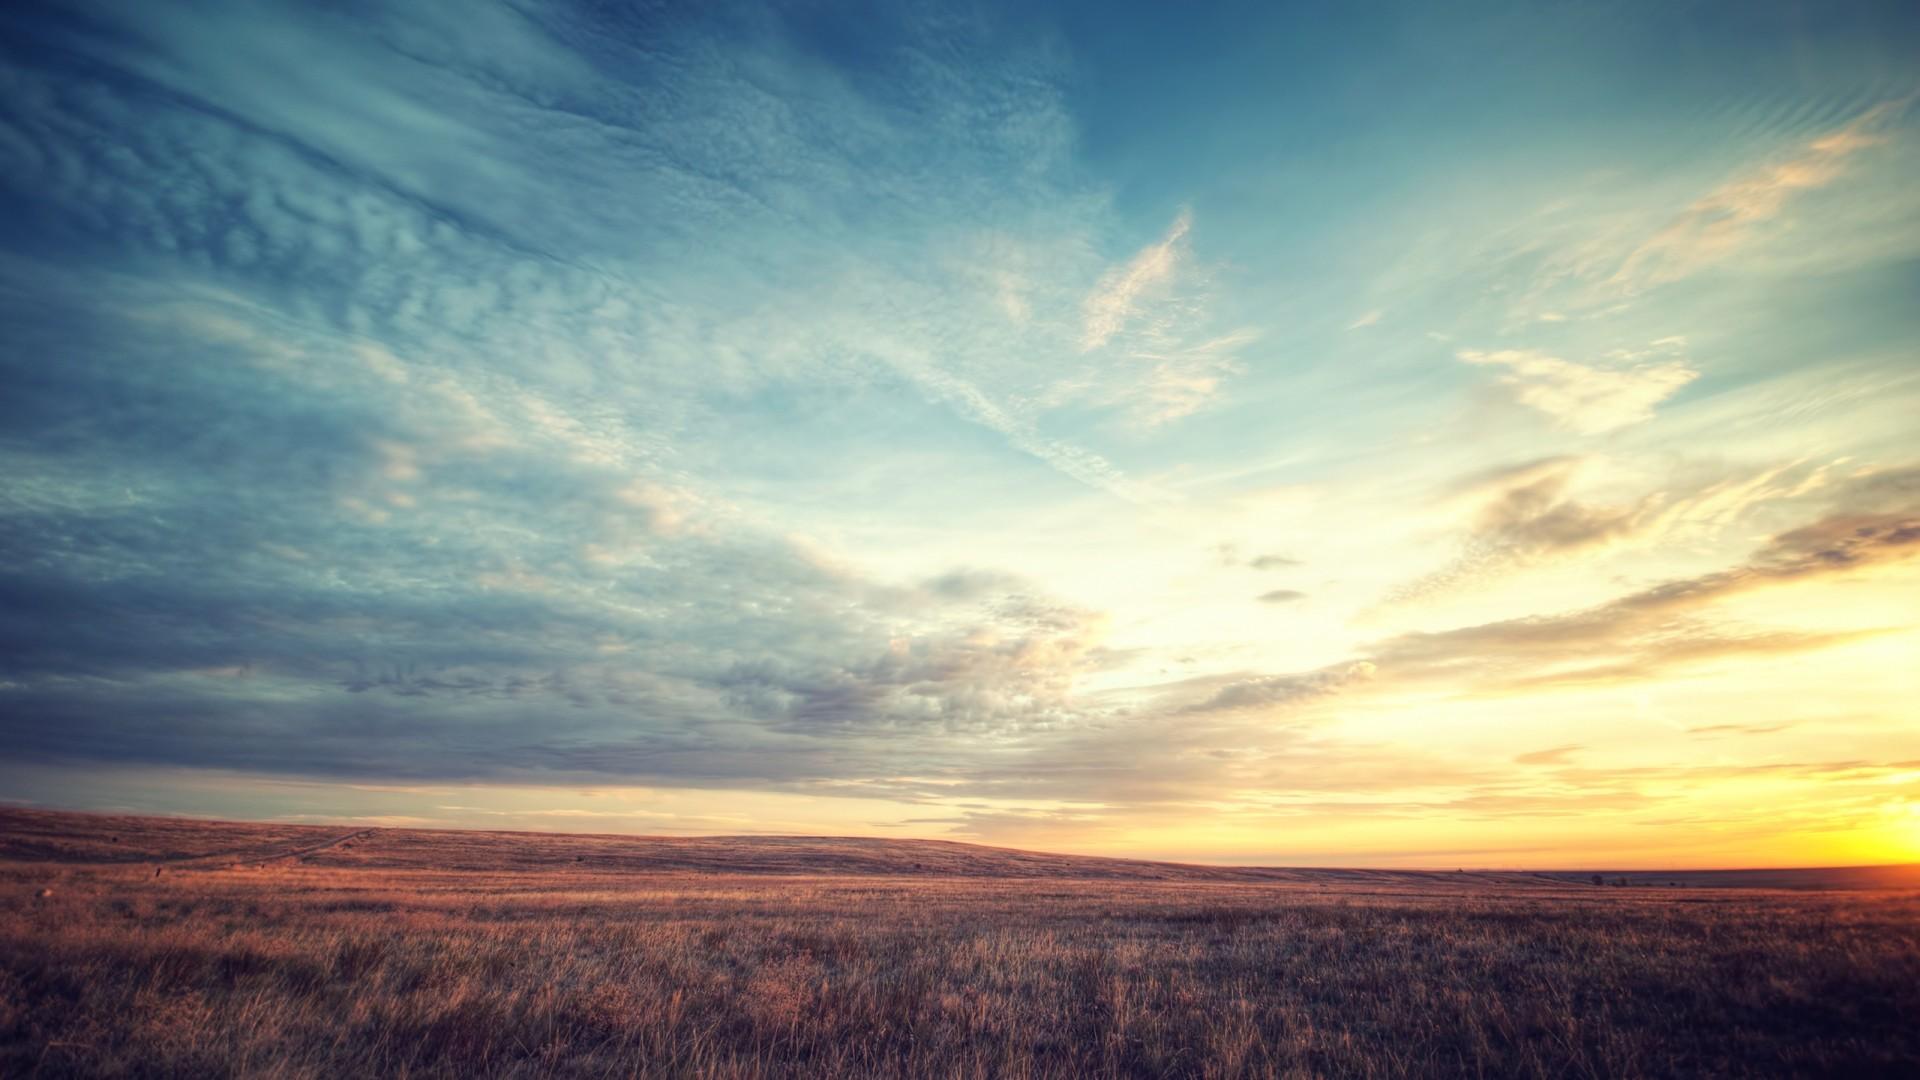 Preview wallpaper field, dawn, sky, beautiful scenery 1920×1080